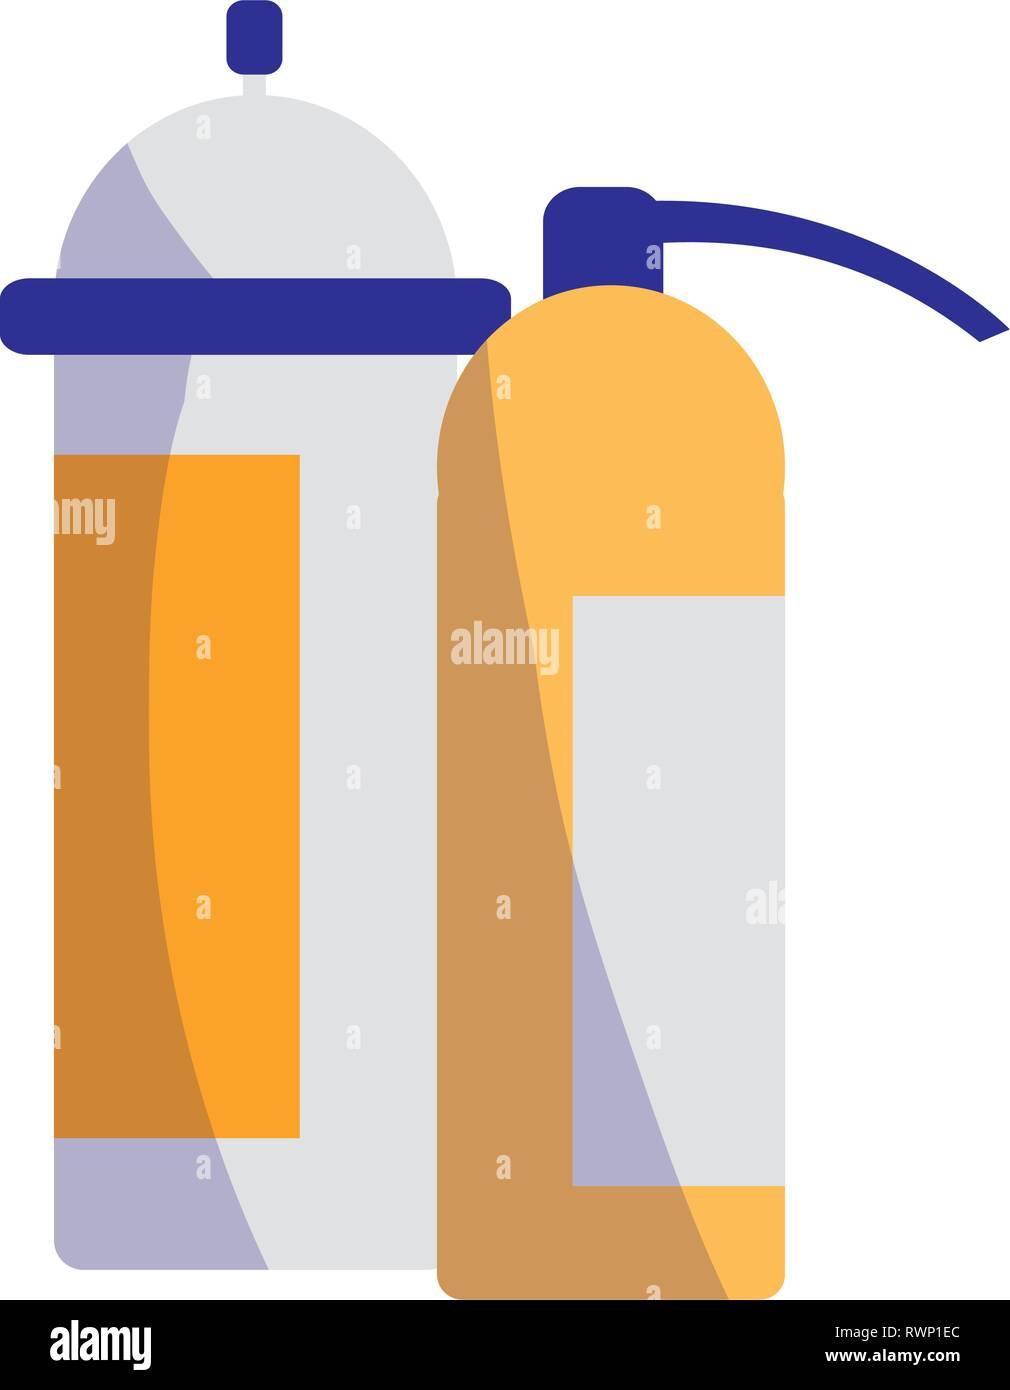 extinguisher fire equipment icon vector illustration design - Stock Image